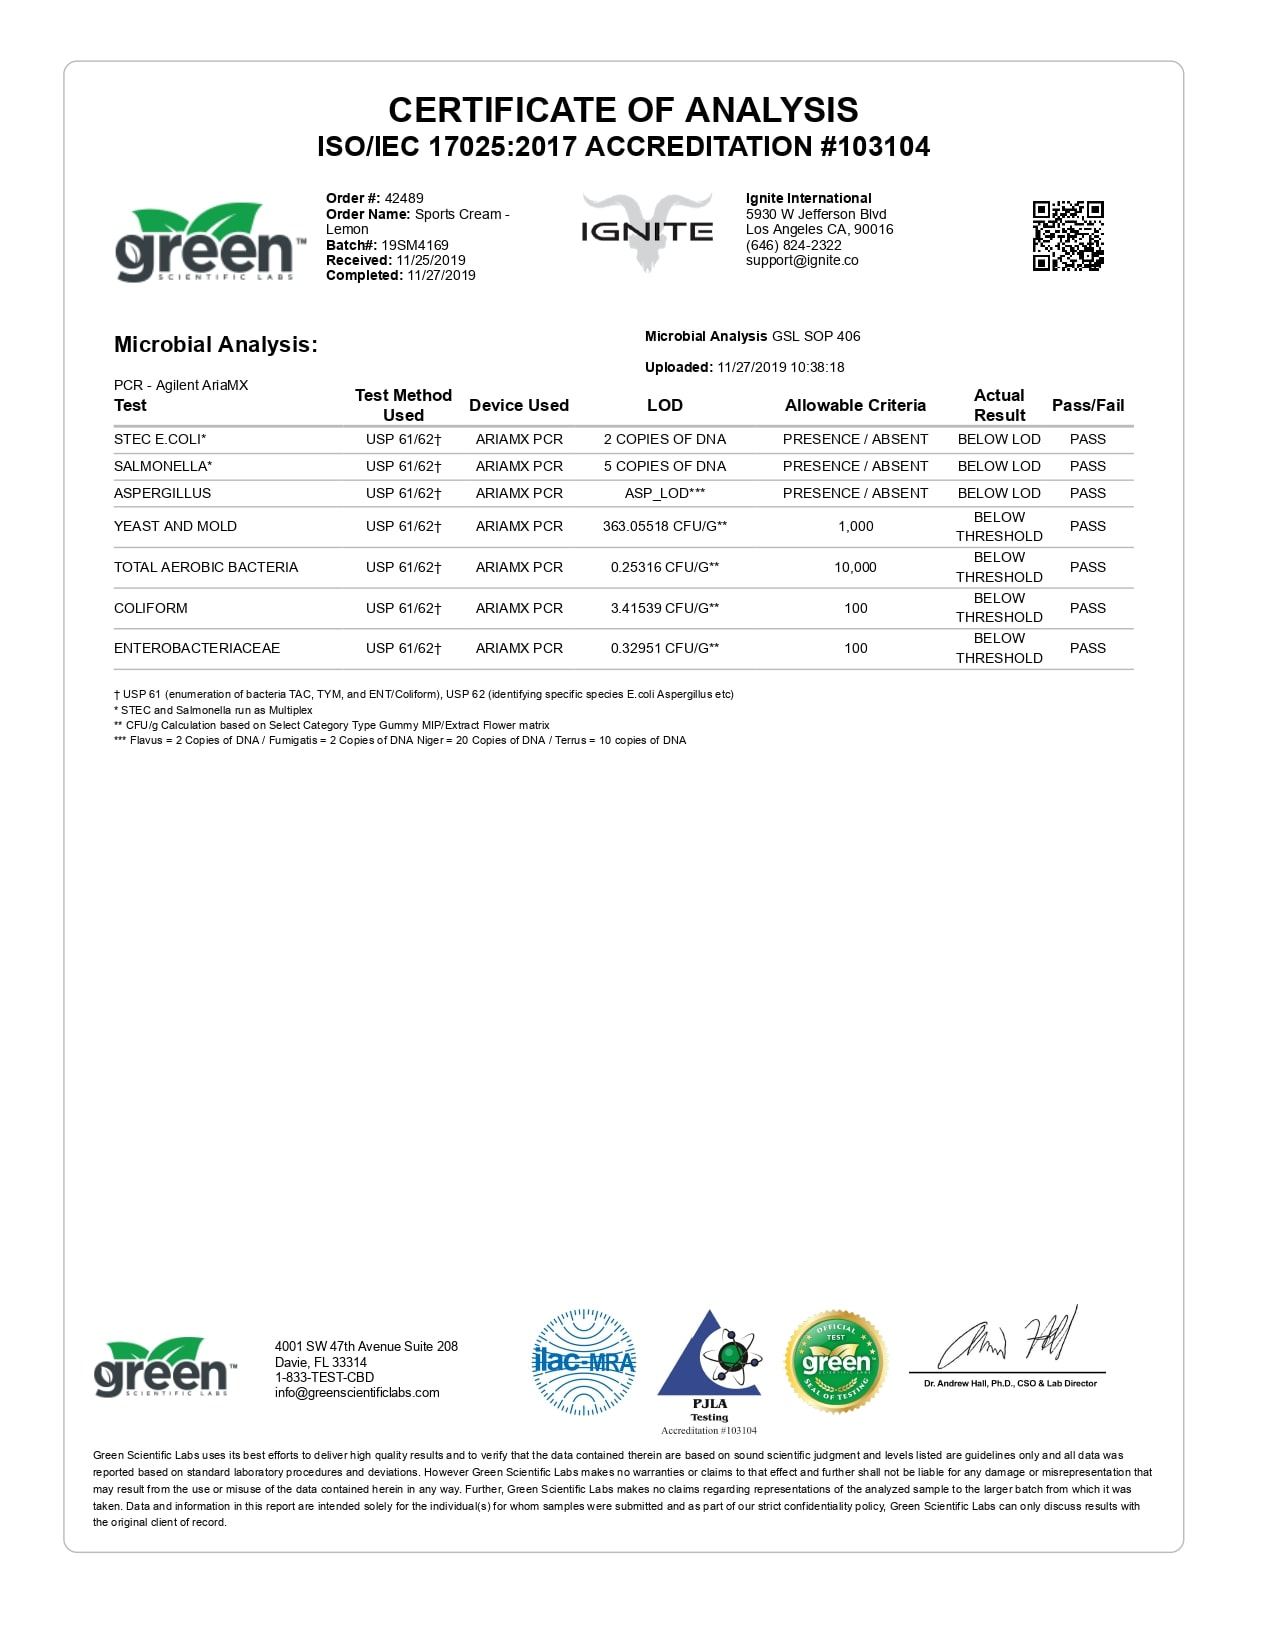 IGNITE CBD Sport Cream Lemon Recharge 1000mg Lab Report